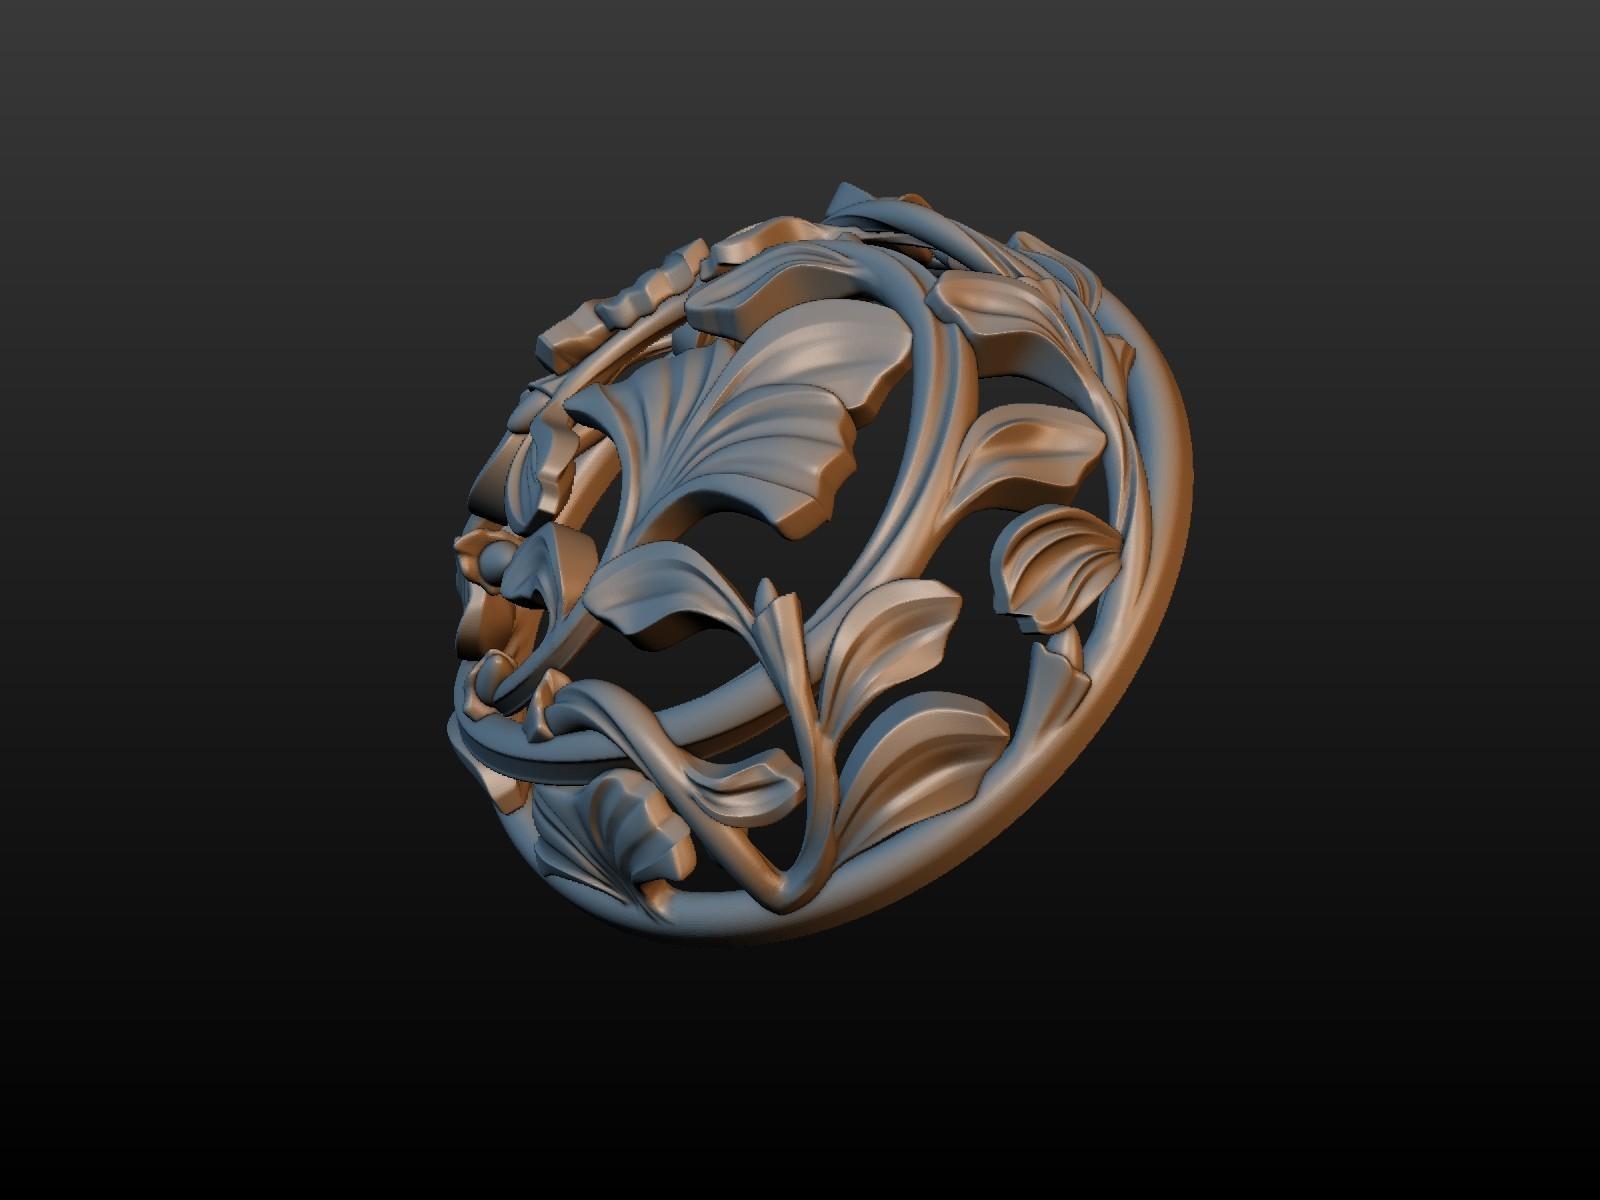 Earring-02.jpg Download STL file Earring • 3D printing template, Skazok